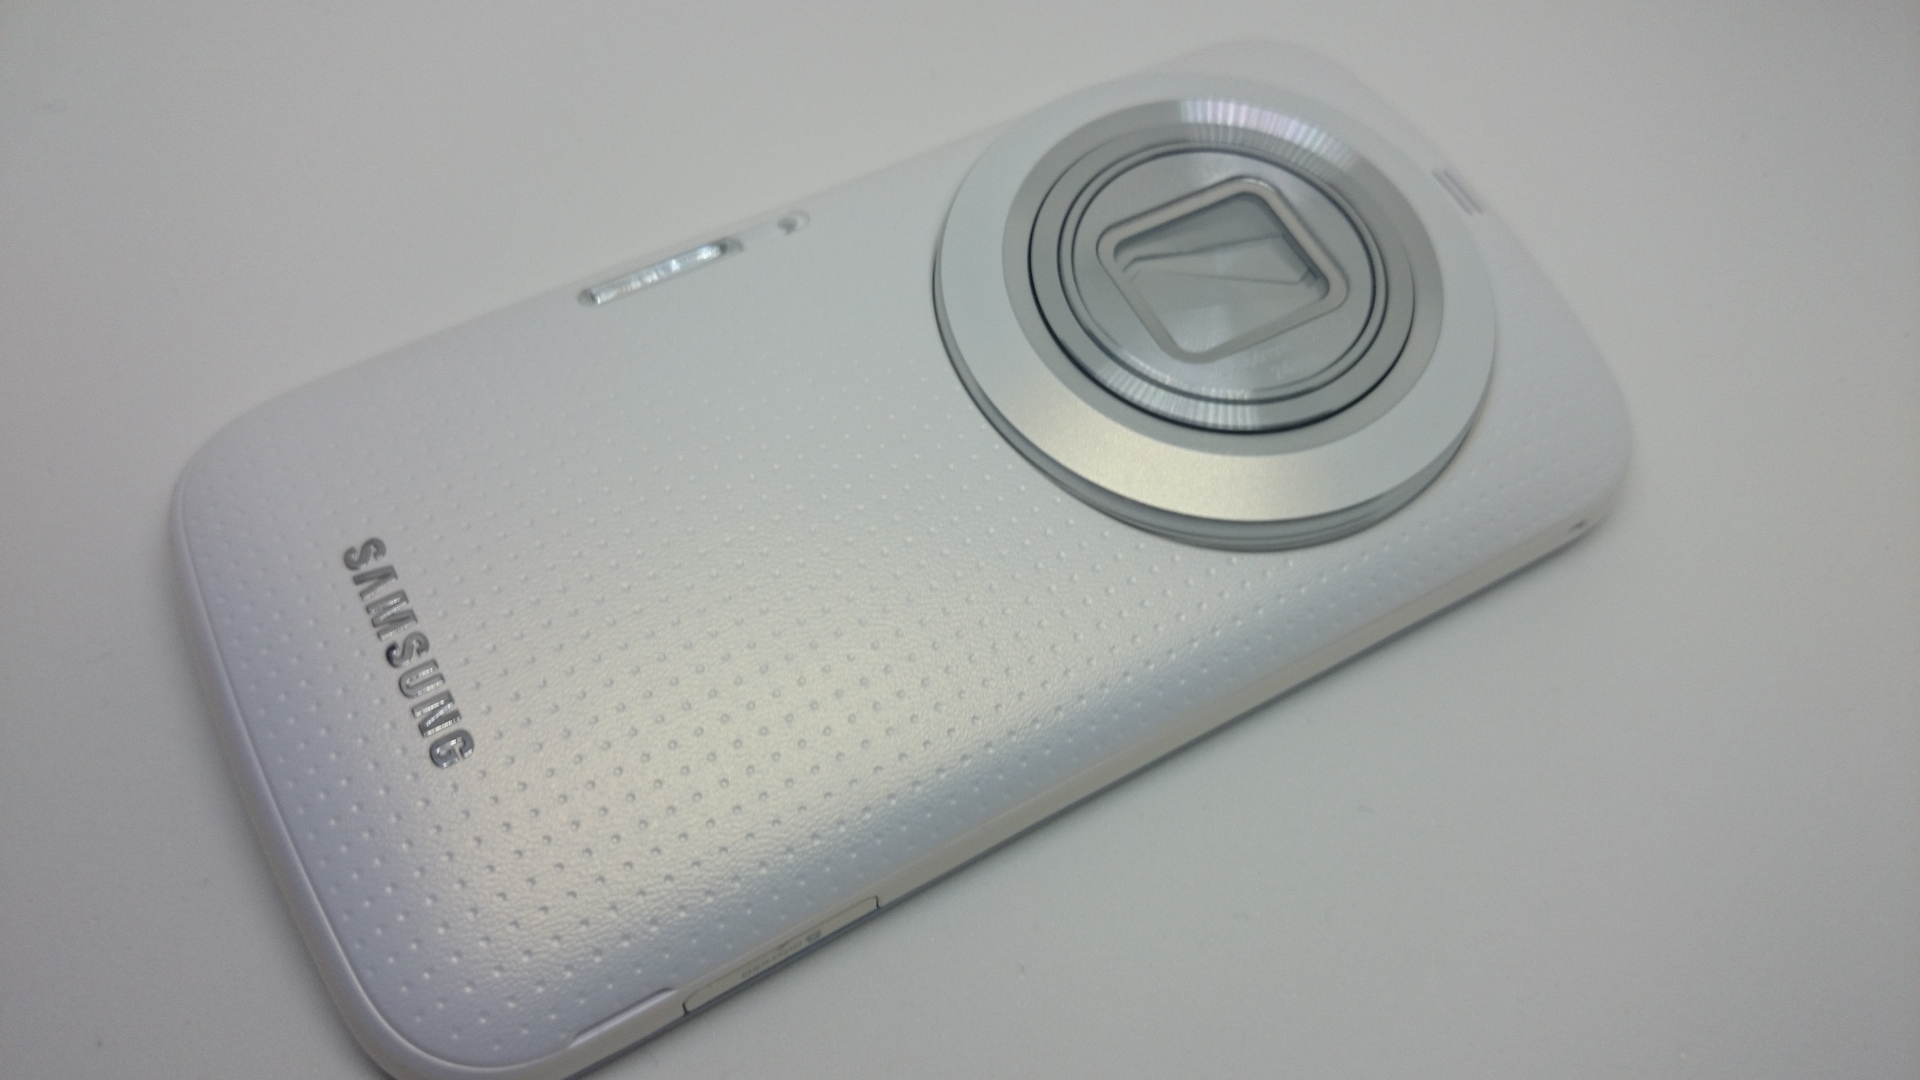 Samsung Galaxy K Zoom Review Coolsmartphone 8gb Black